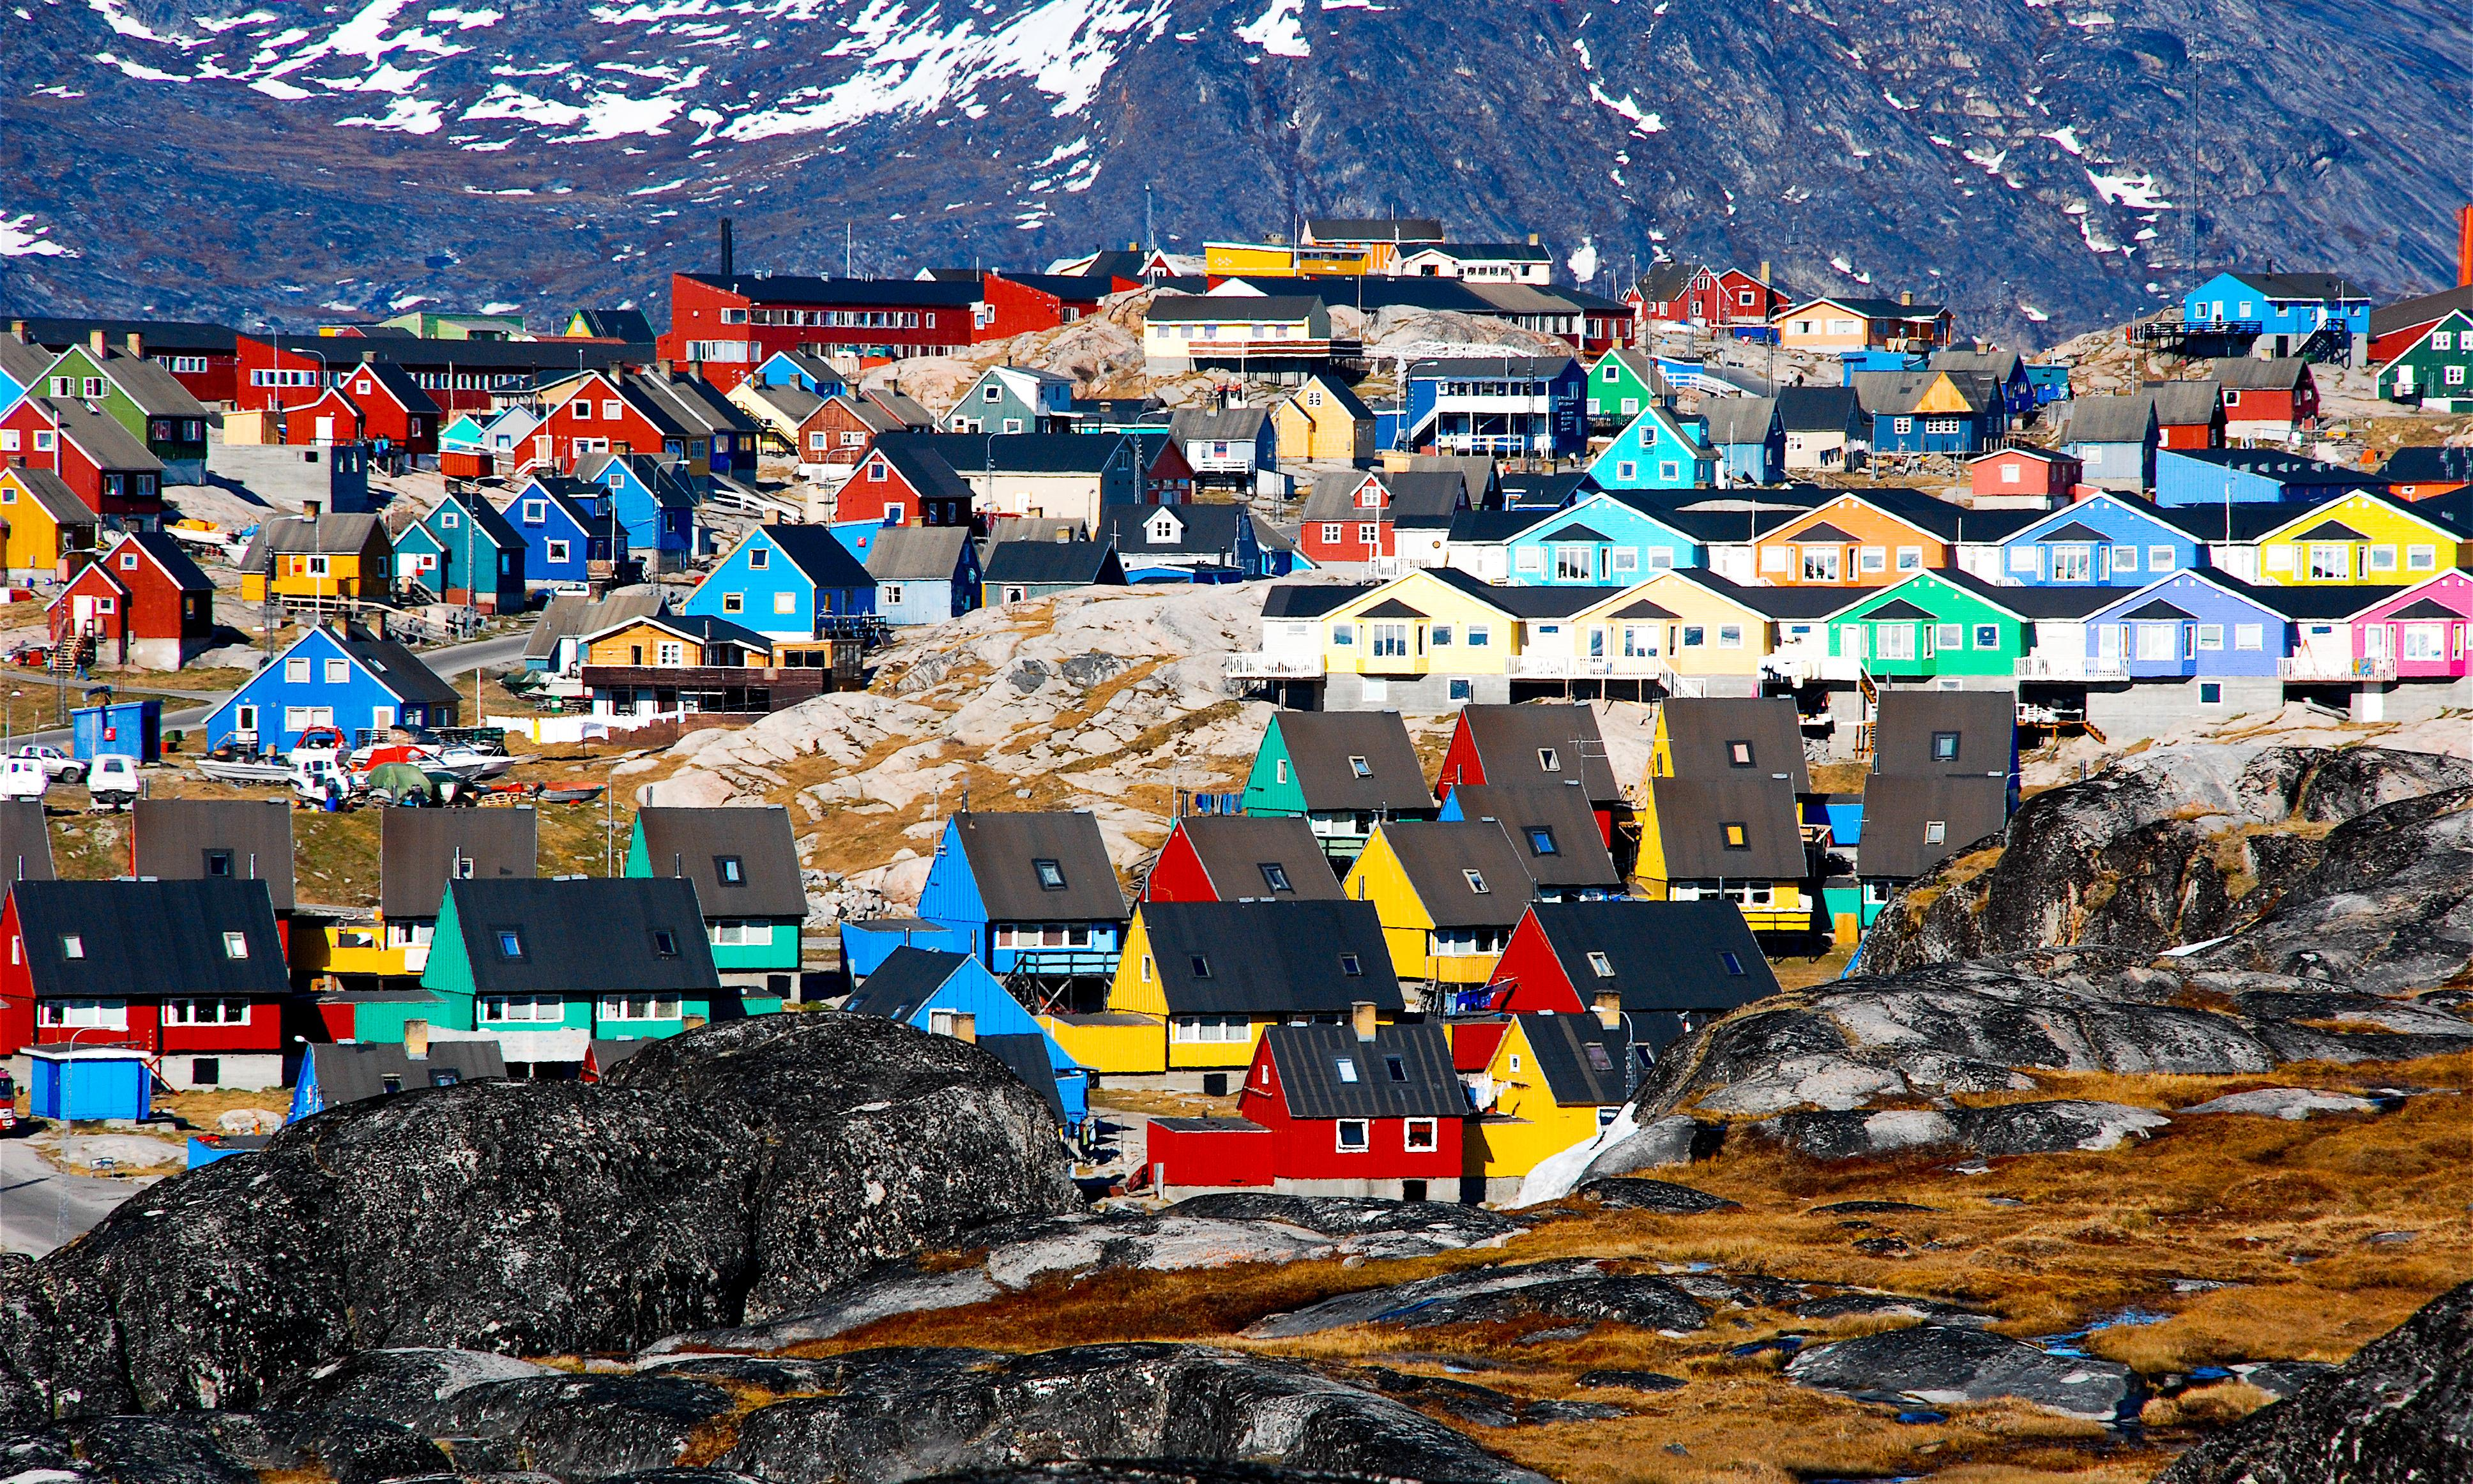 Trump tweets image of enormous Trump Tower on Greenland